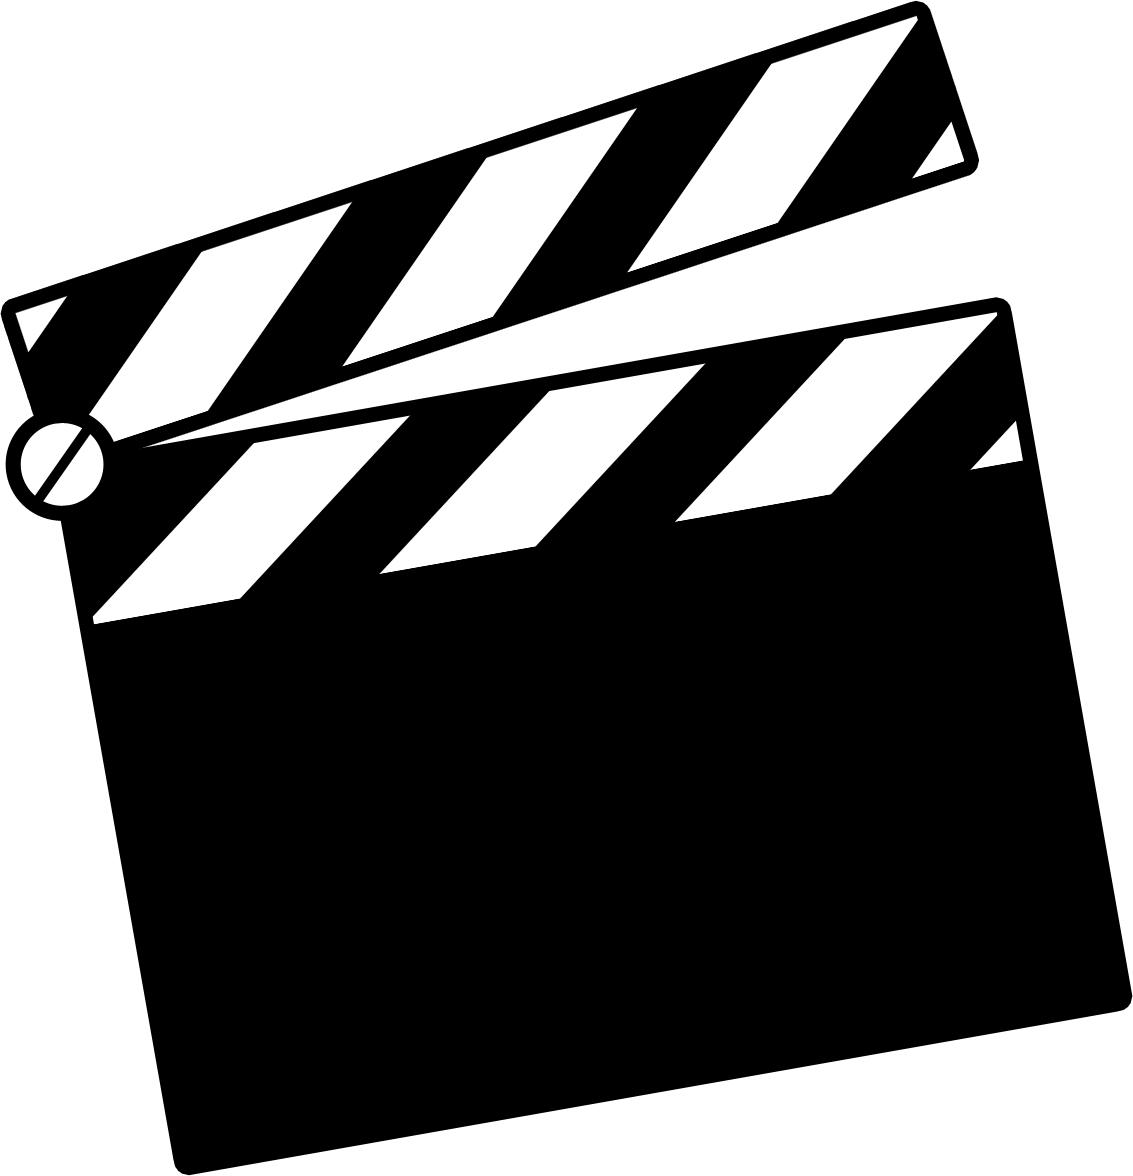 1133x1176 Motion Picture Film Format Clipart